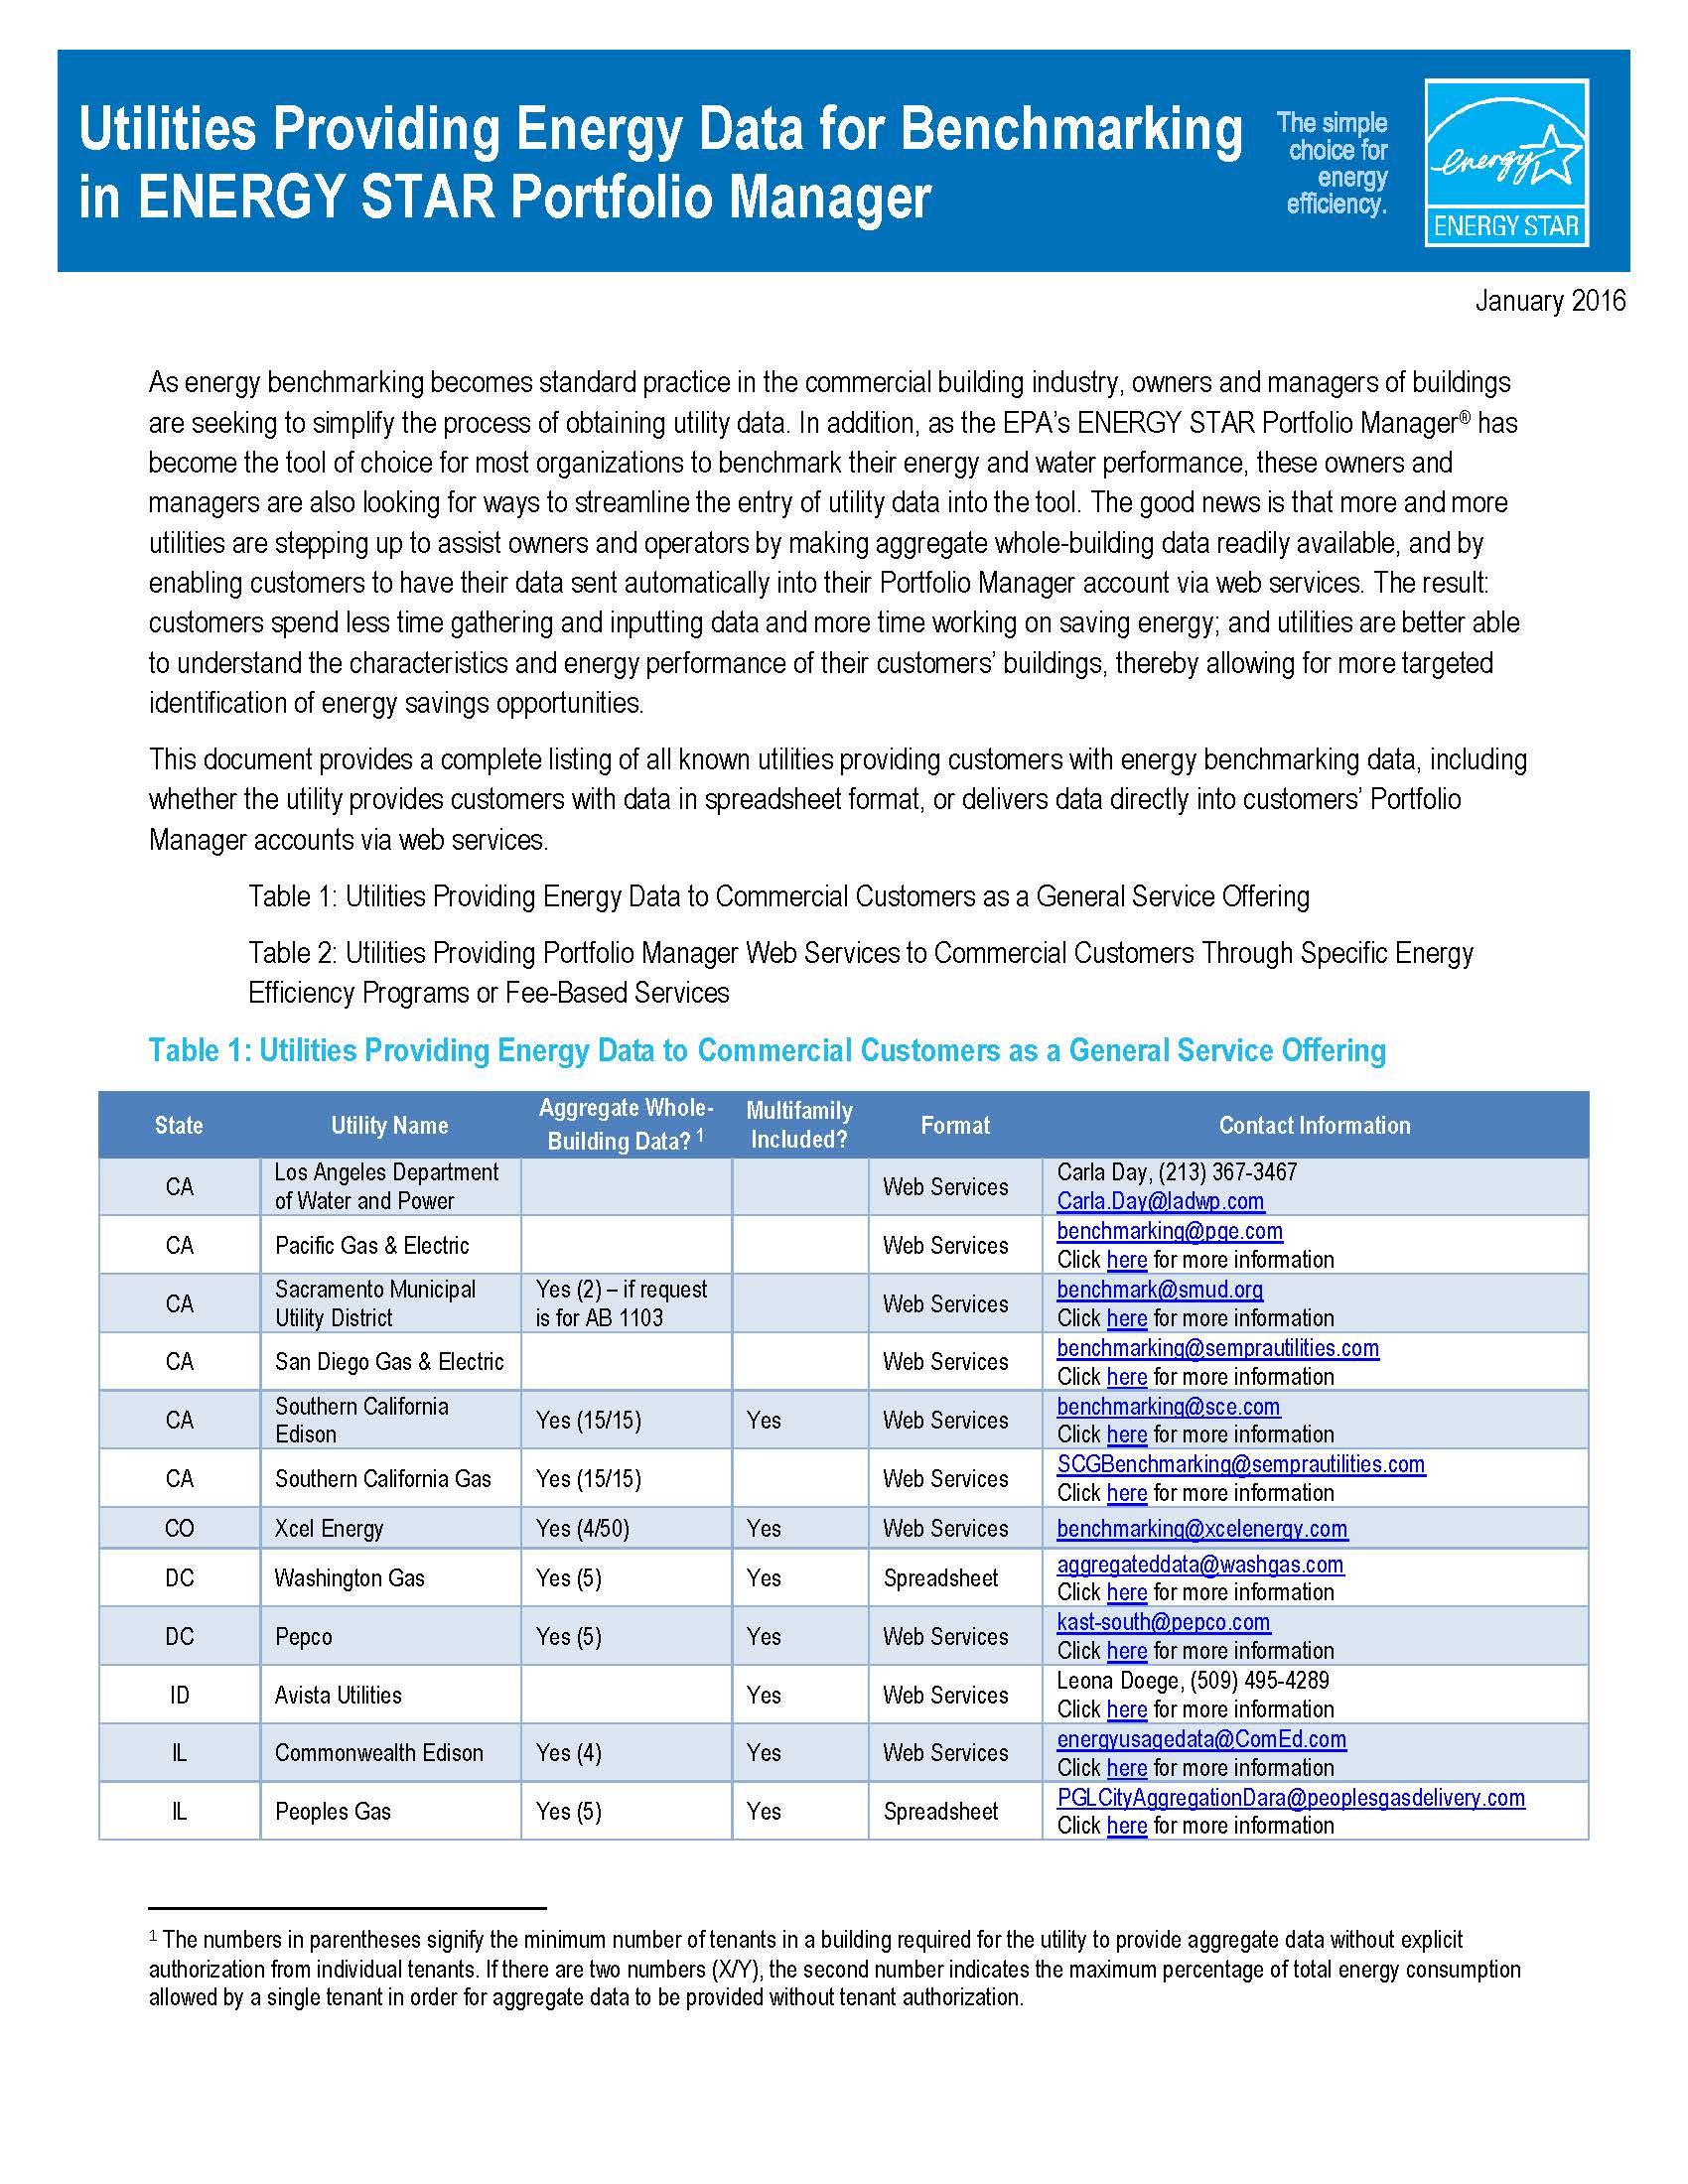 Web Services Fact Sheet thumbnail